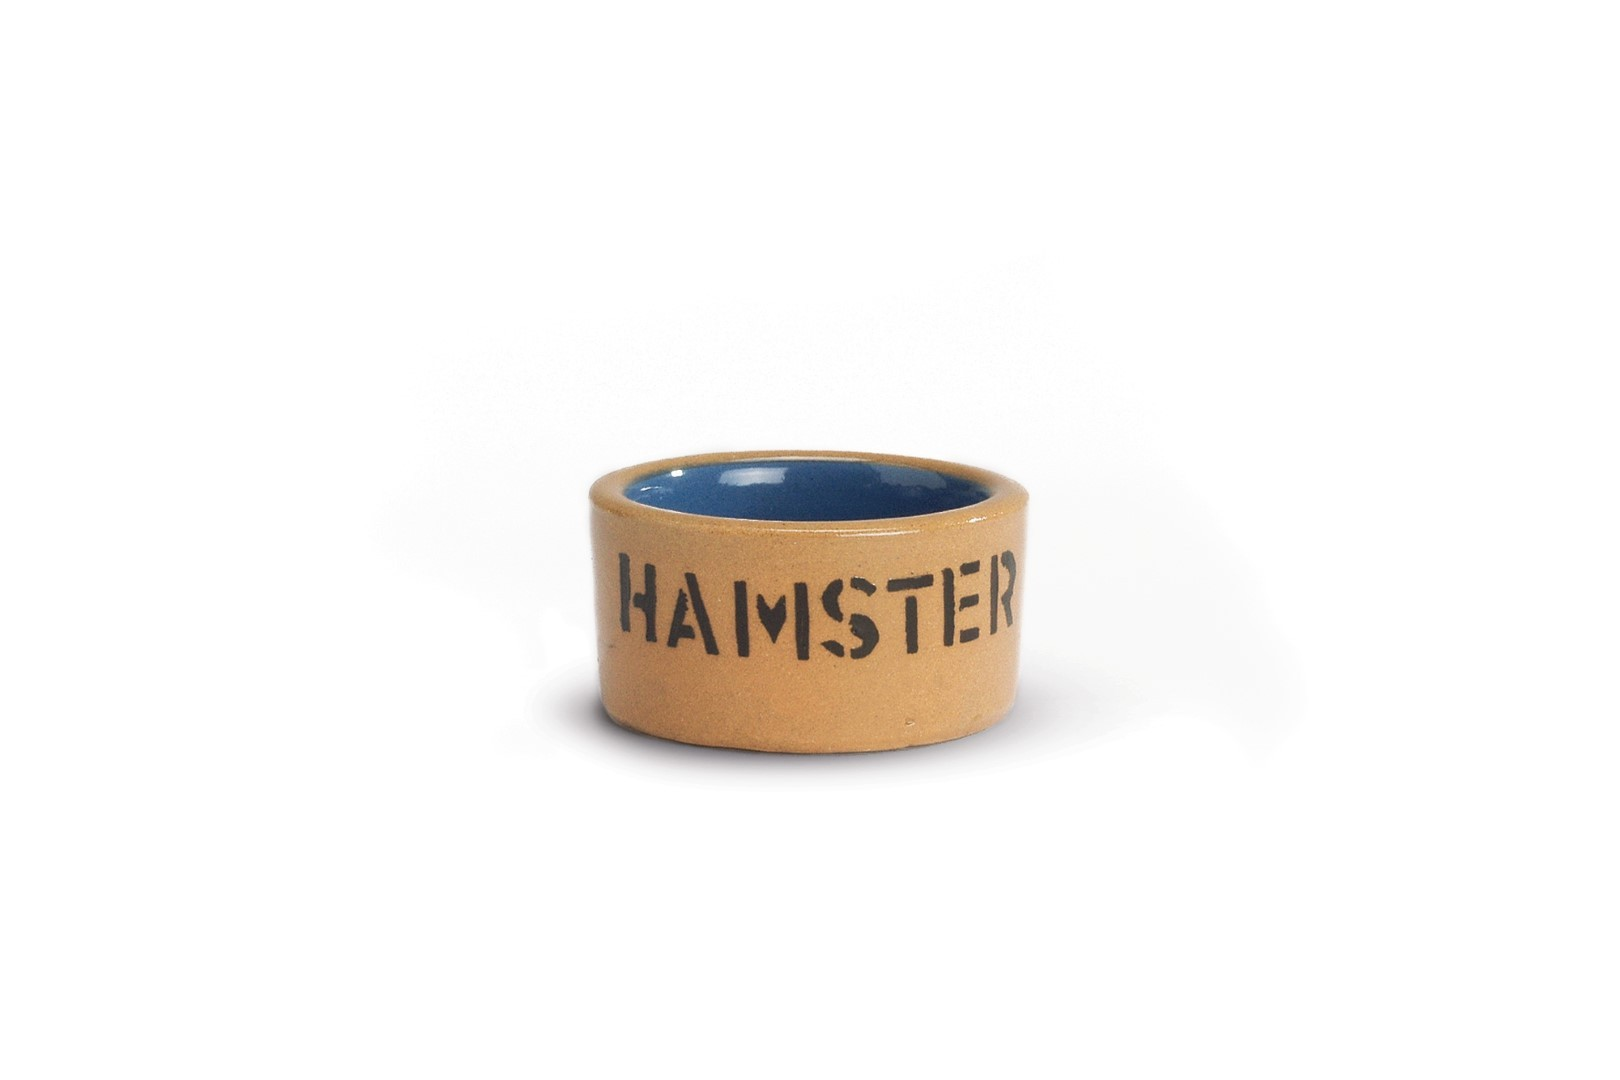 Keramieken hamsterbak hamster blauw/bge